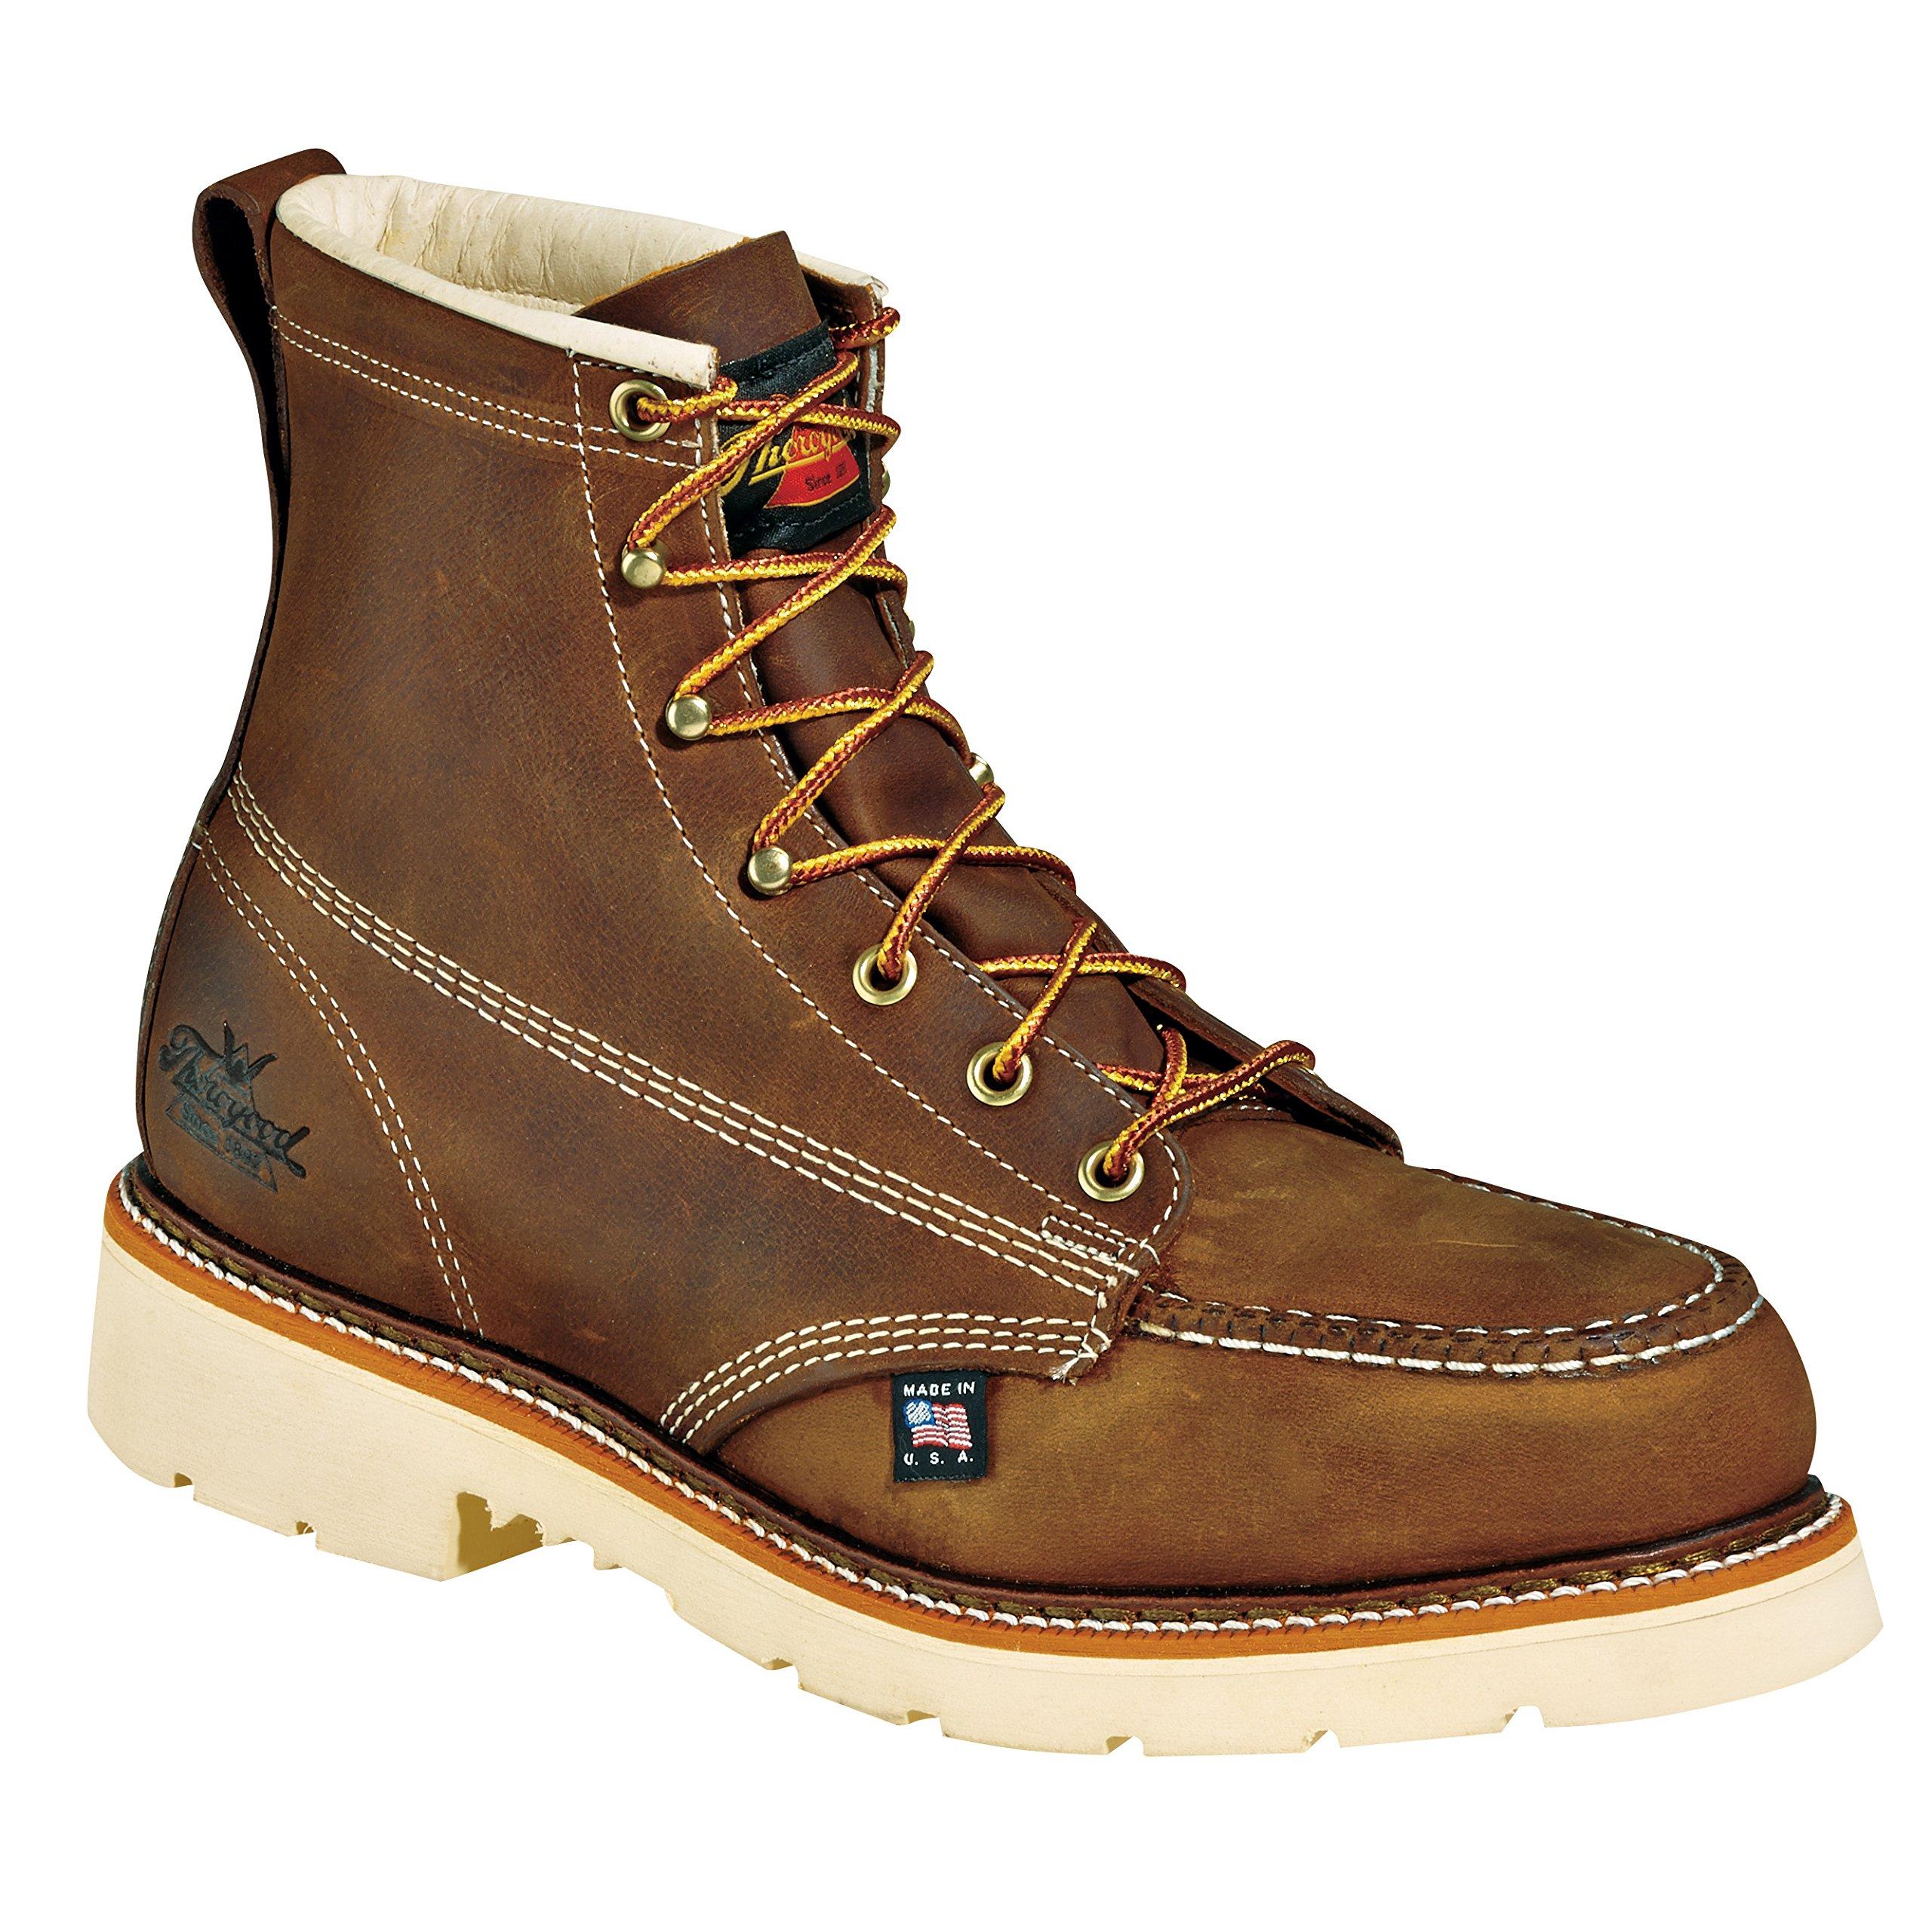 Thorogood 804-4375 Men's American Heritage 6'' Moc Toe, MAXwear 90 Safety Toe Boot, Trail Crazyhorse - 12 2E US